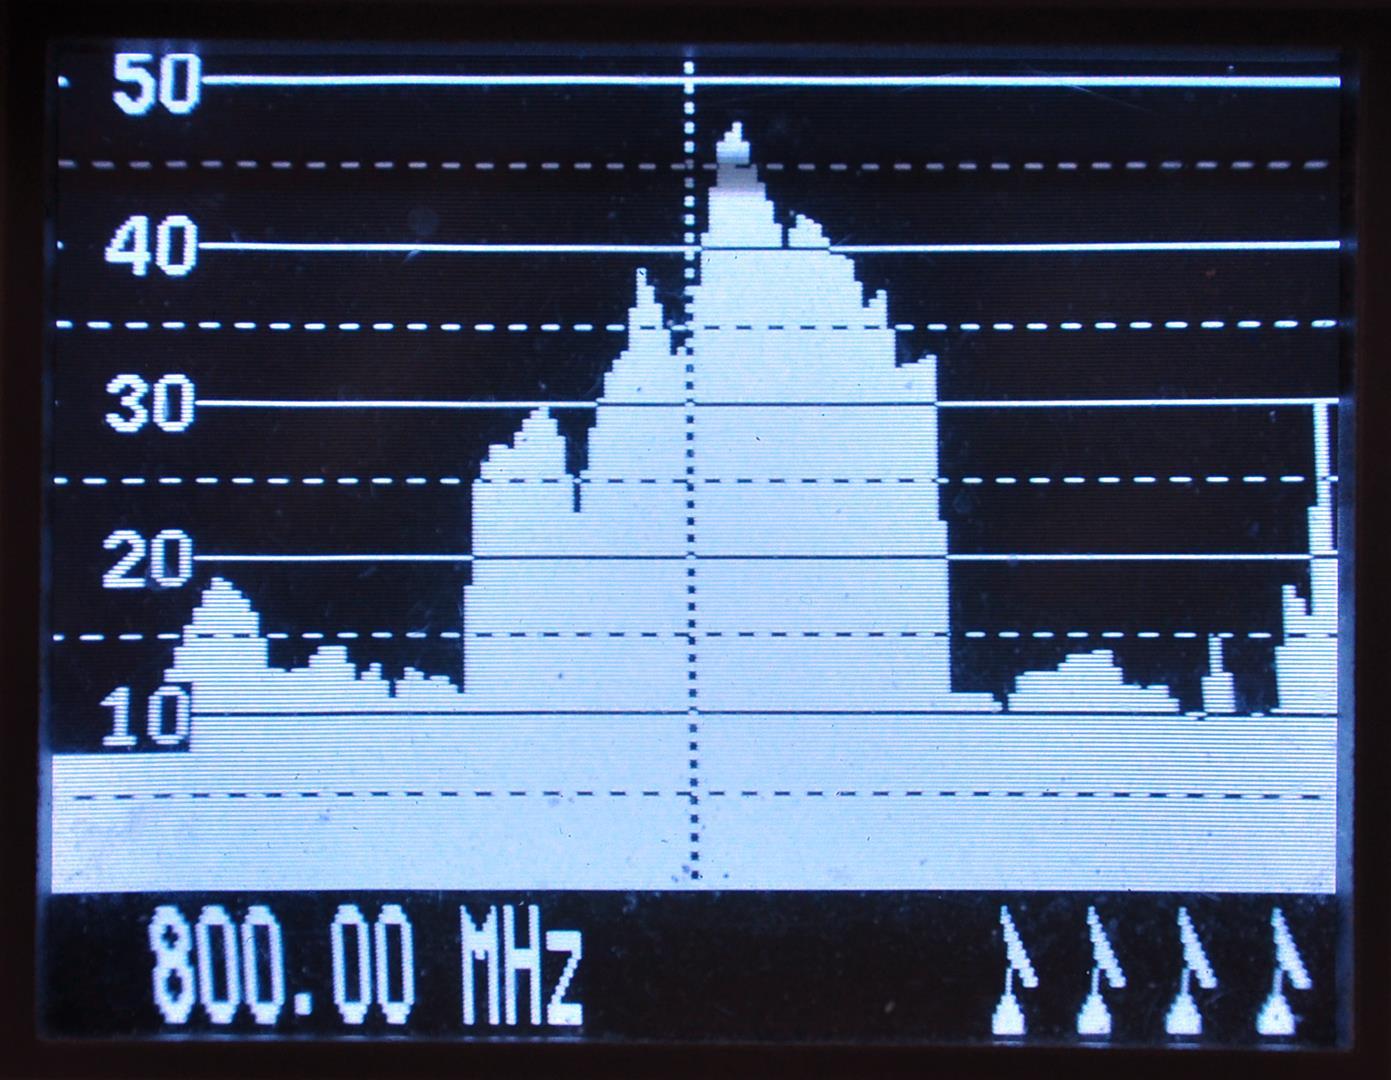 20140813-boxer-5208-800-mhz-utan-filter